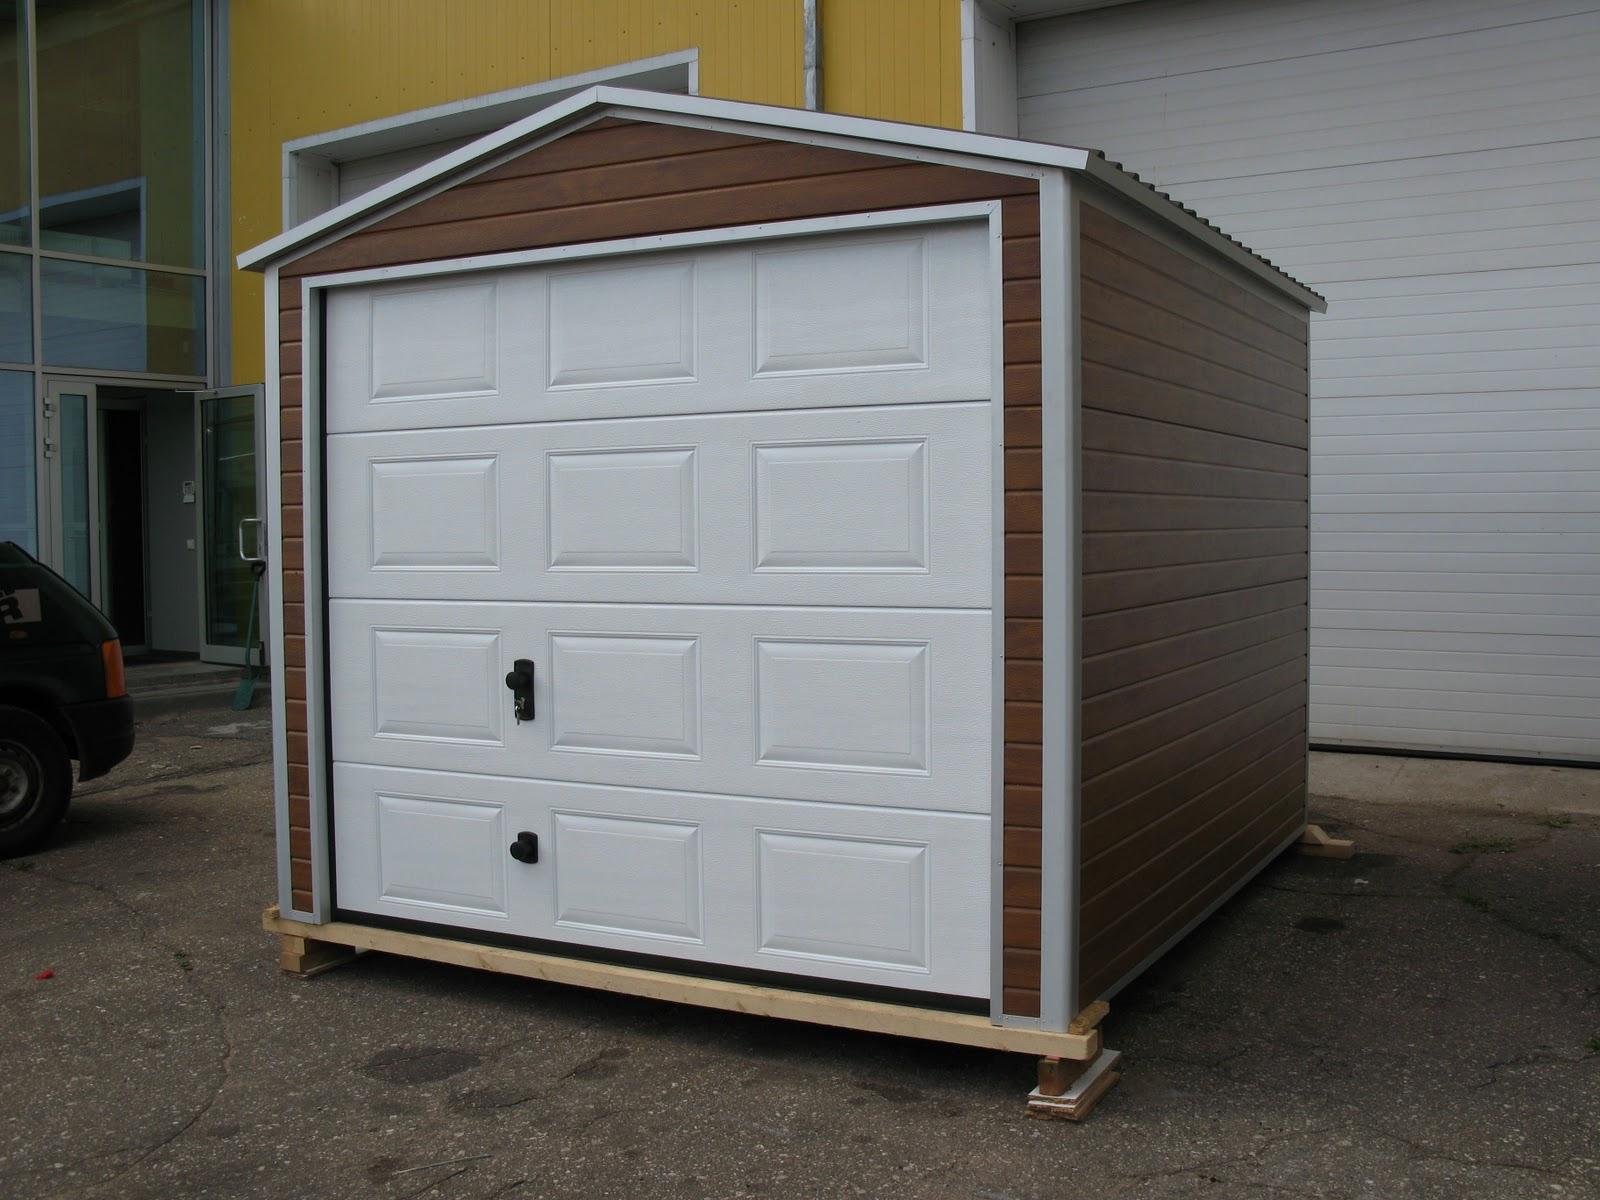 Diy garage or garden shed ryterna garage doors for Garden shed garage